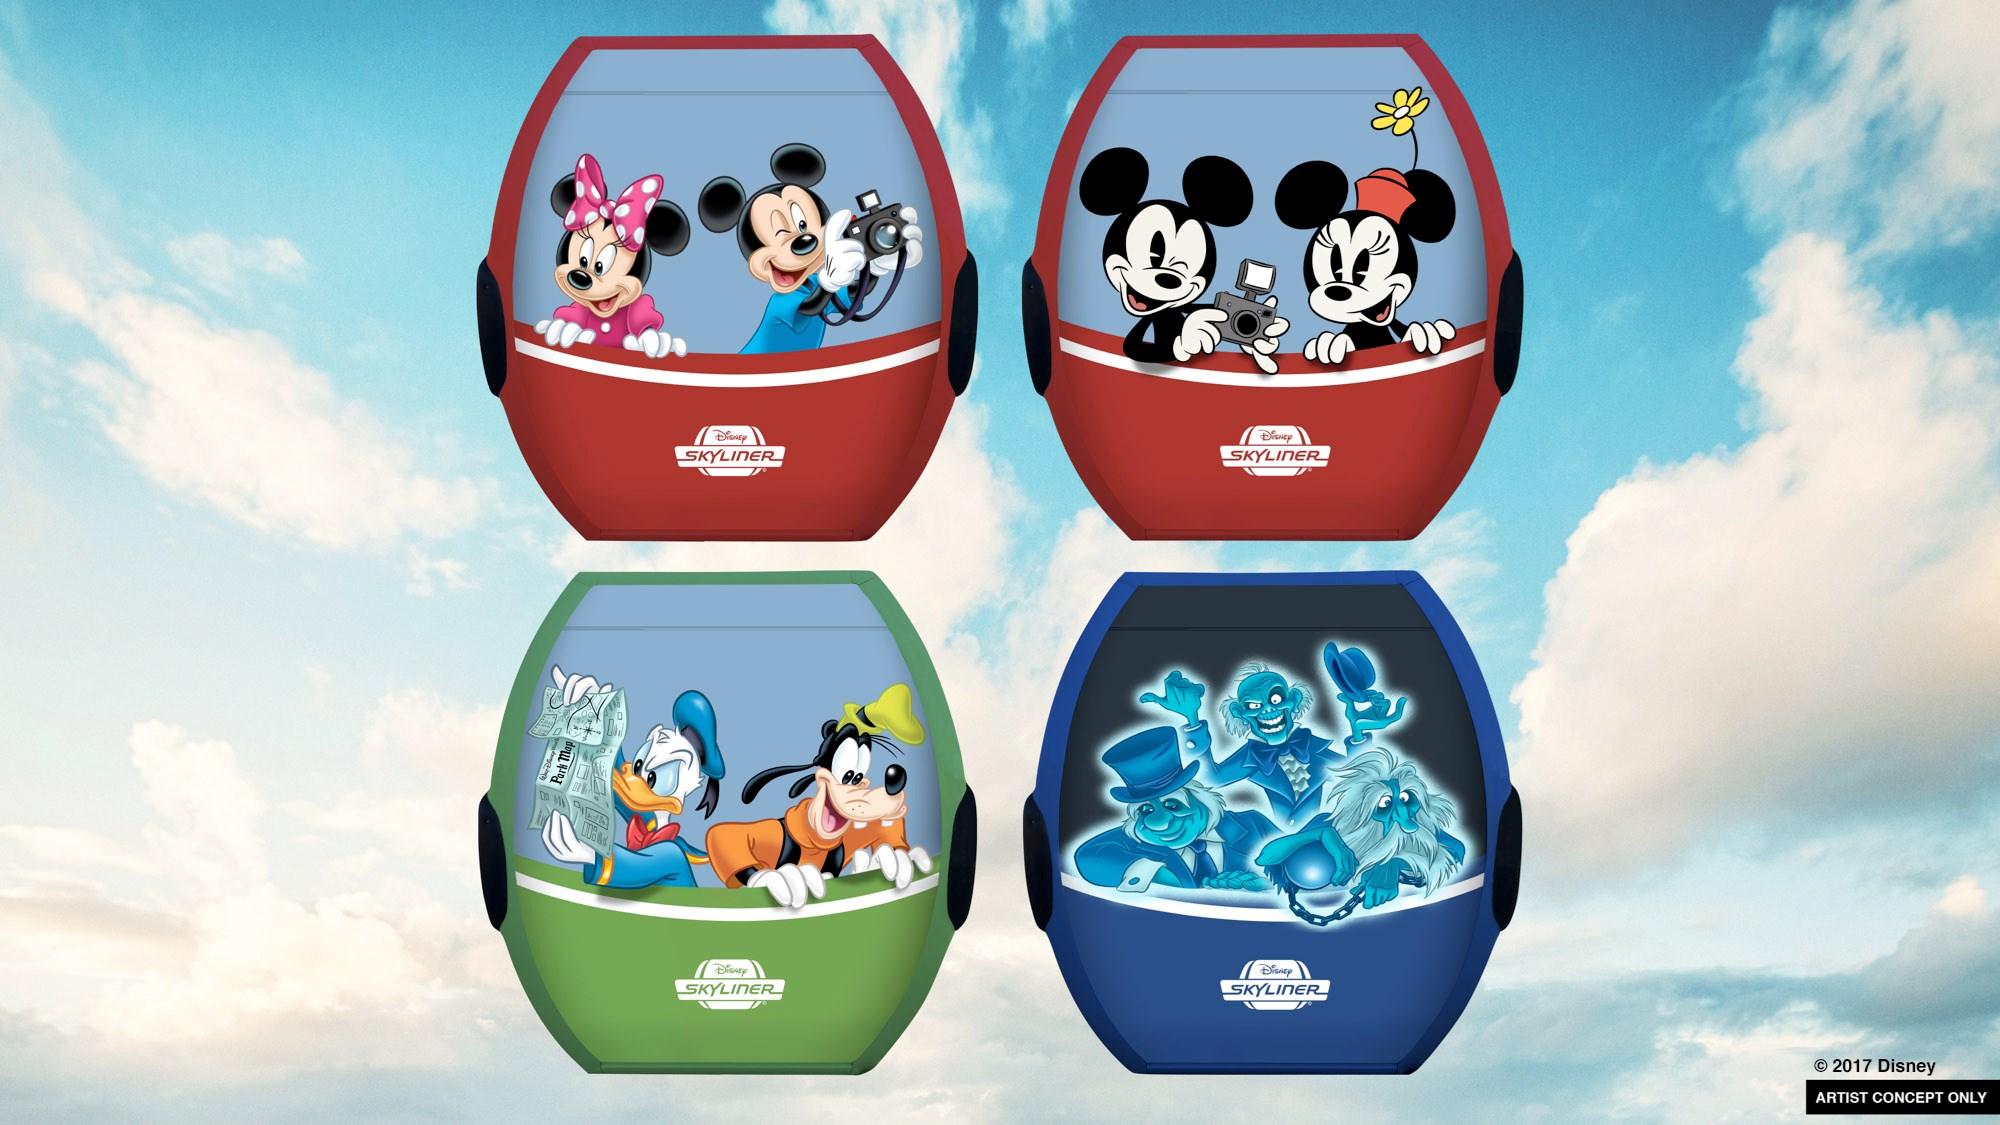 Disney Skyliner concept art